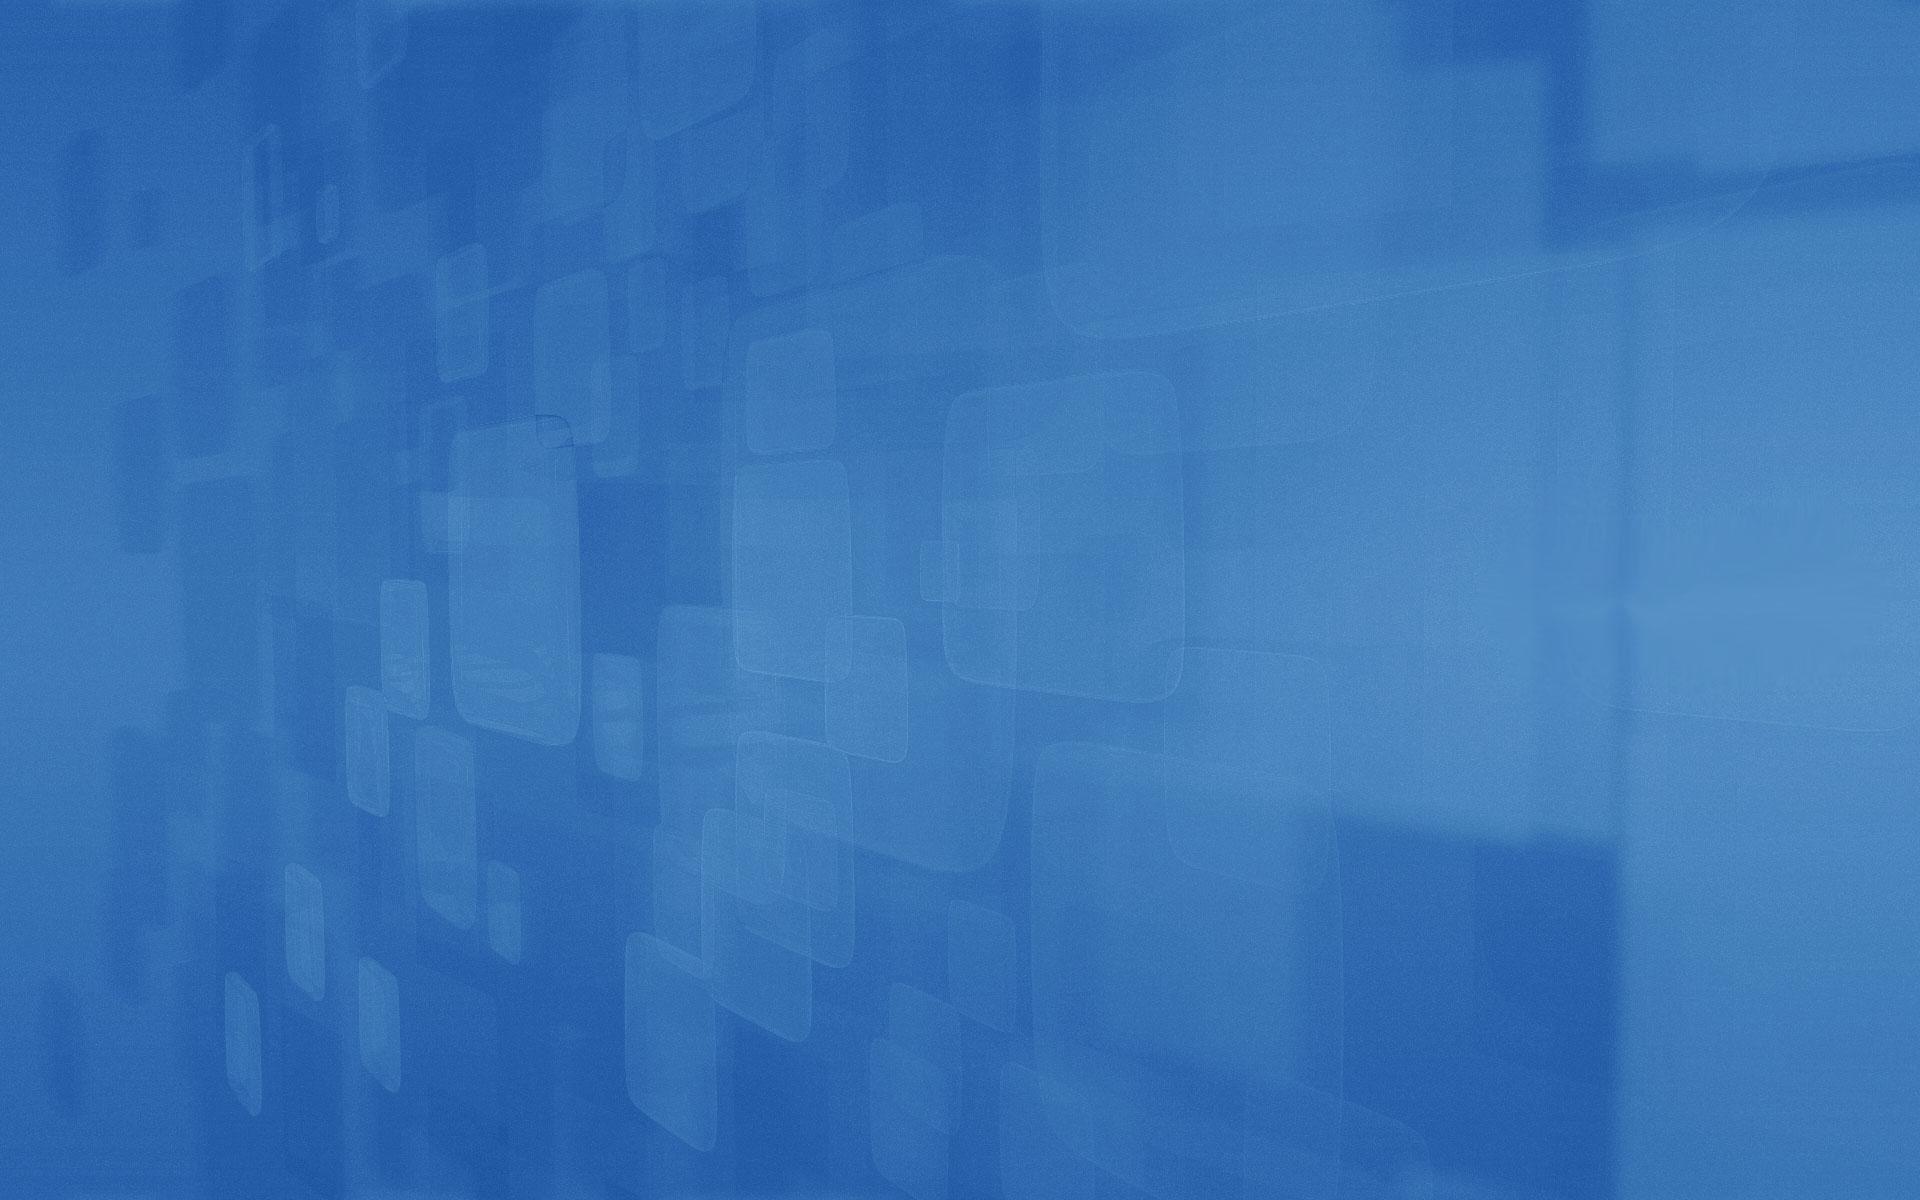 COMPAQ light blue wallpapers COMPAQ light blue stock photos 1920x1200